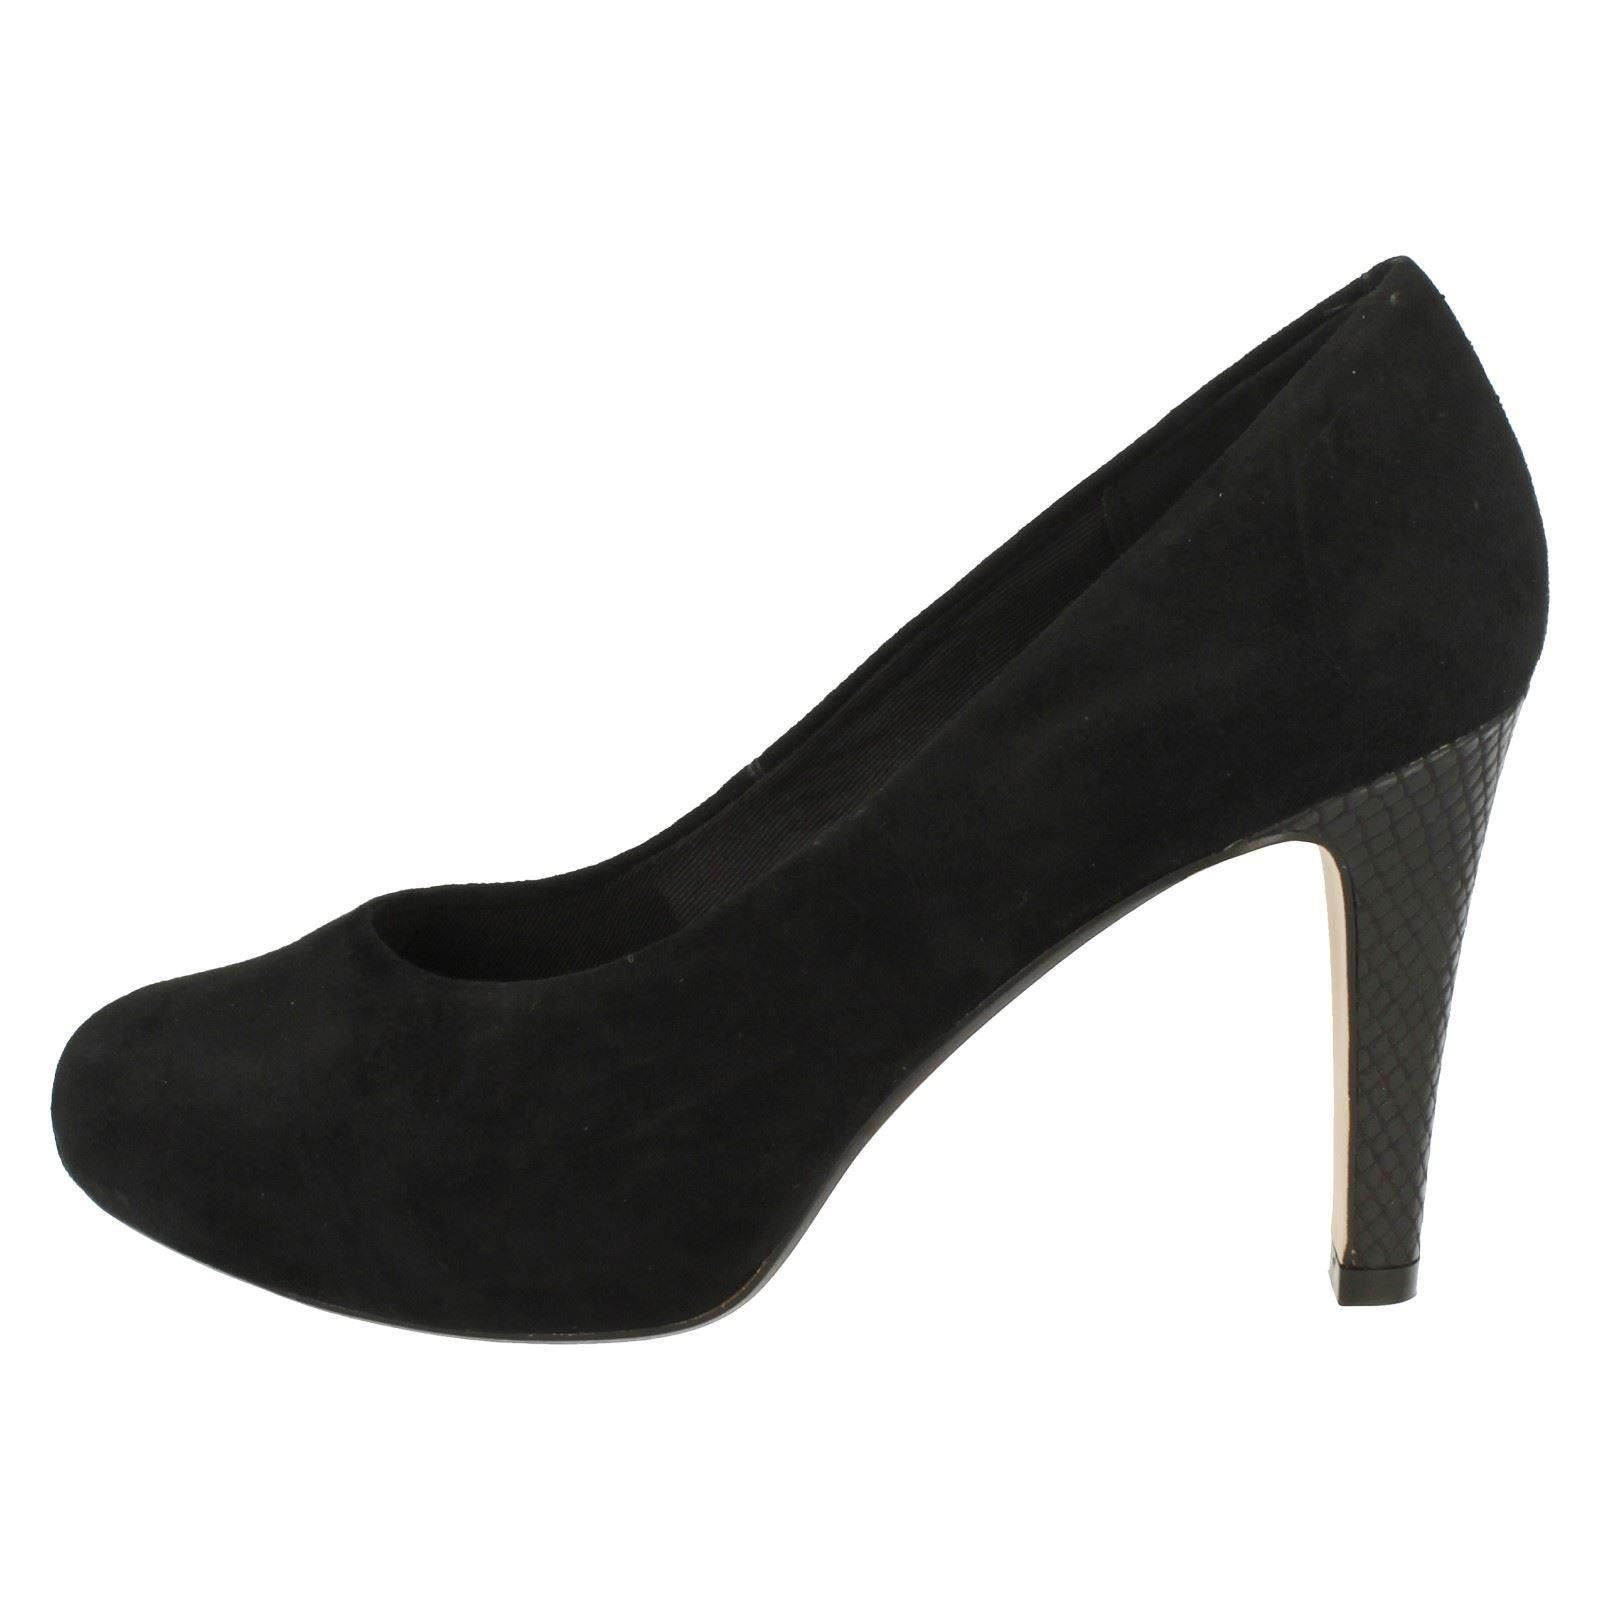 'carrick Zapatos Clarks Salón Mujer Maraña' De xqqUw